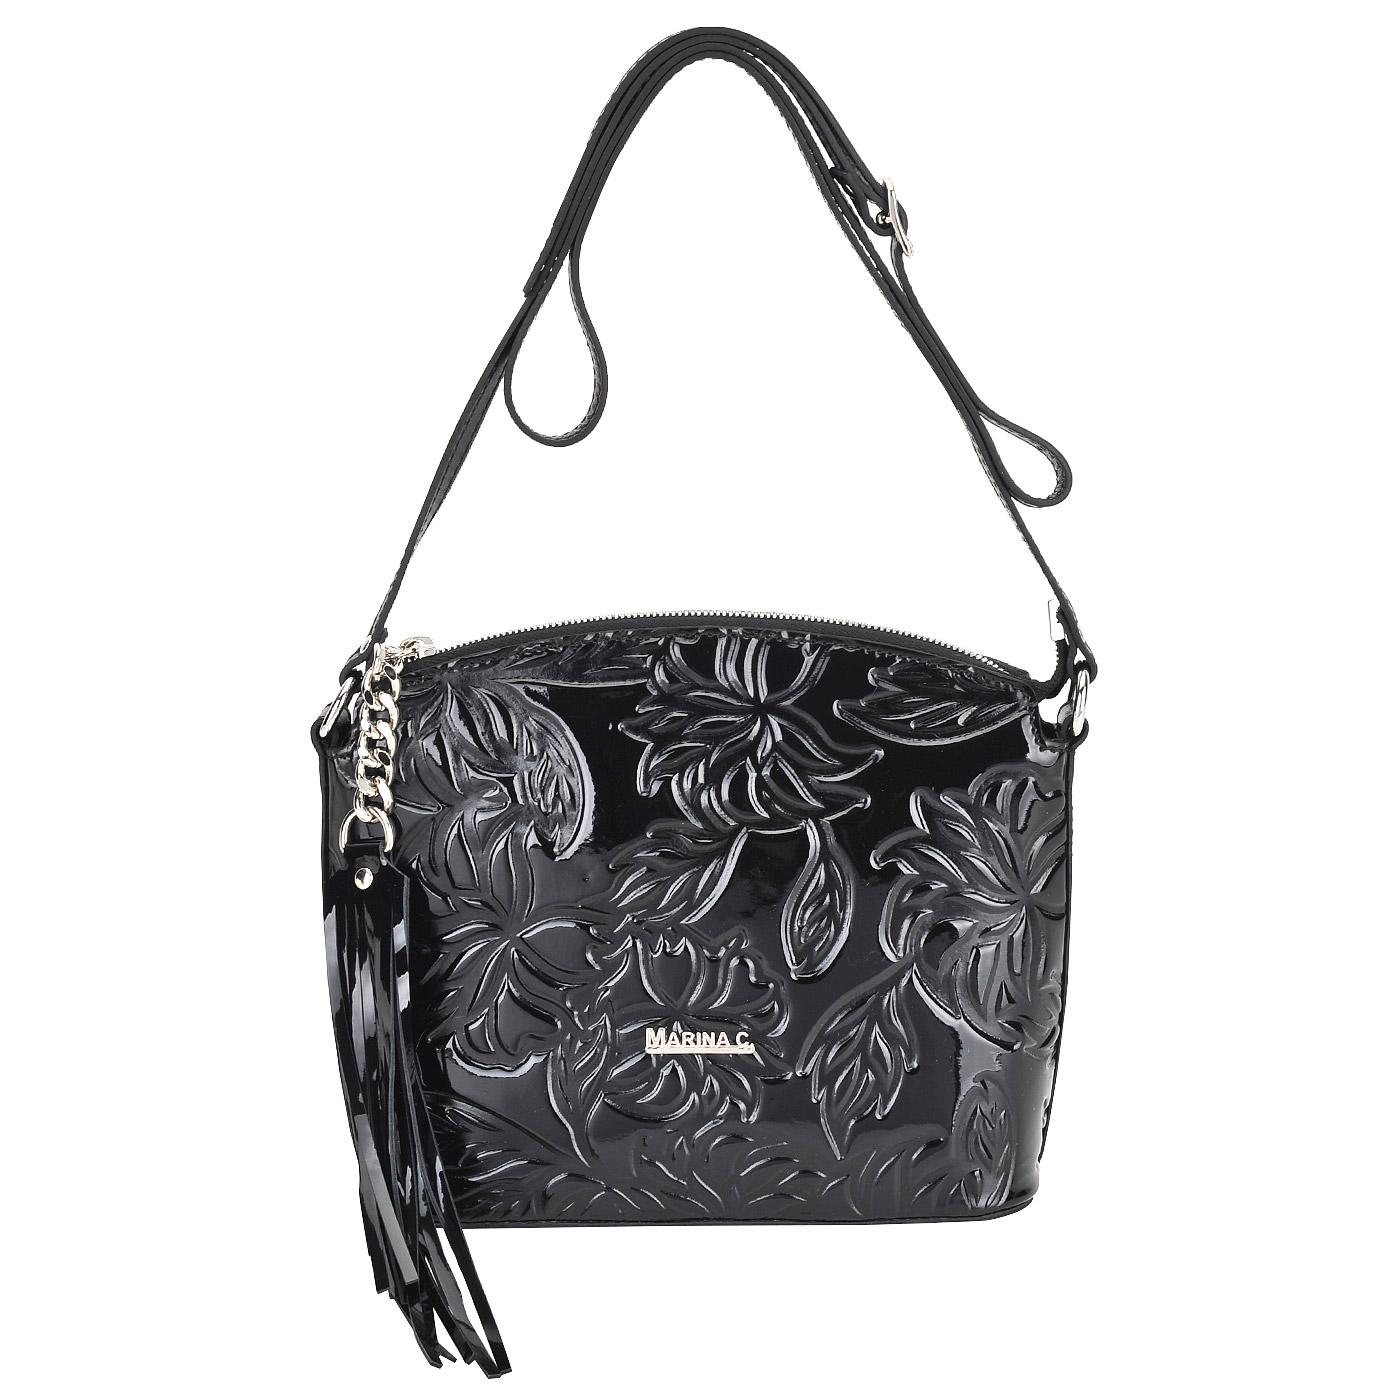 СумкаСумки через плечо<br>Marina Creazioni, сумка жен, н/к, лак, тисн, цветы , черн.<br>